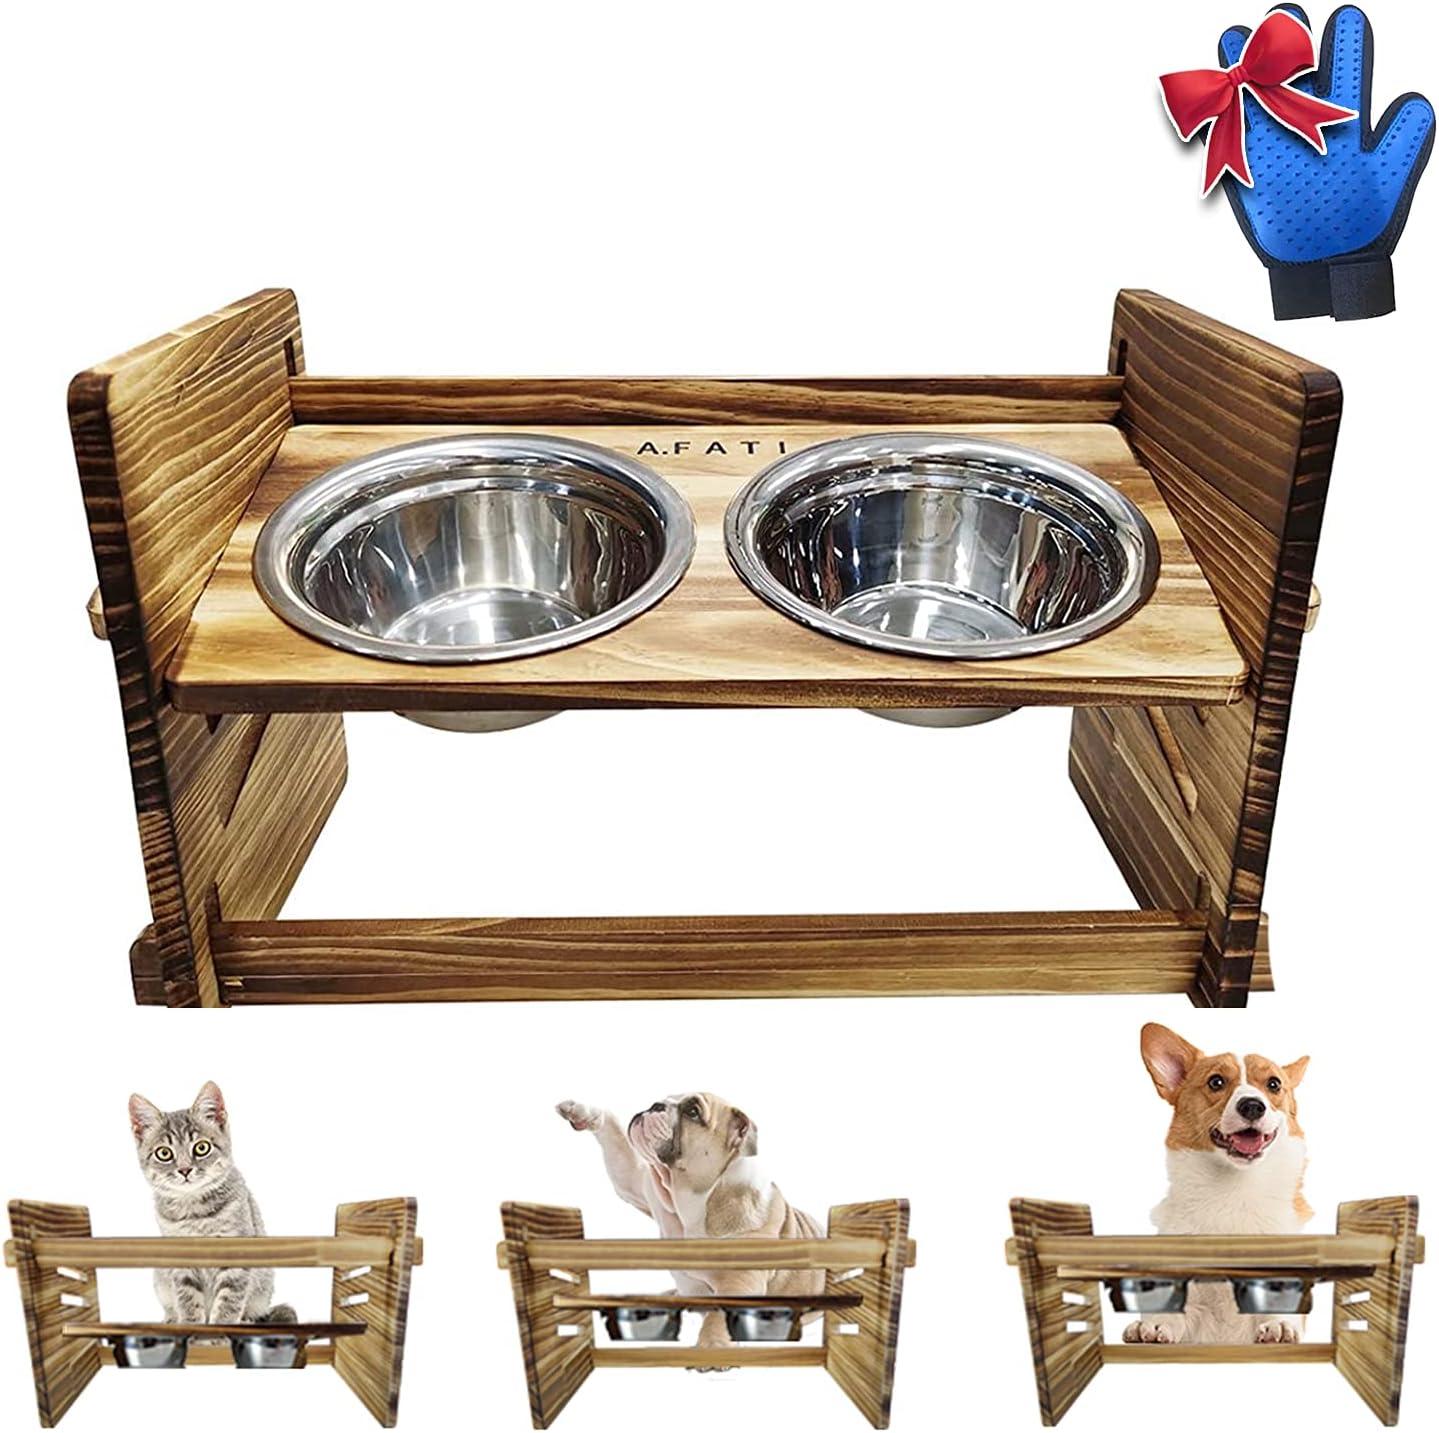 A.FATI Elevated Dog Bowls,Dog Cat Bowls Raised Dog Bowl Stand Feeder Adjustable Elevated 3 Heights,Raised Dog Bowl Stand Feeder with 2 Stainless Steel Bowls